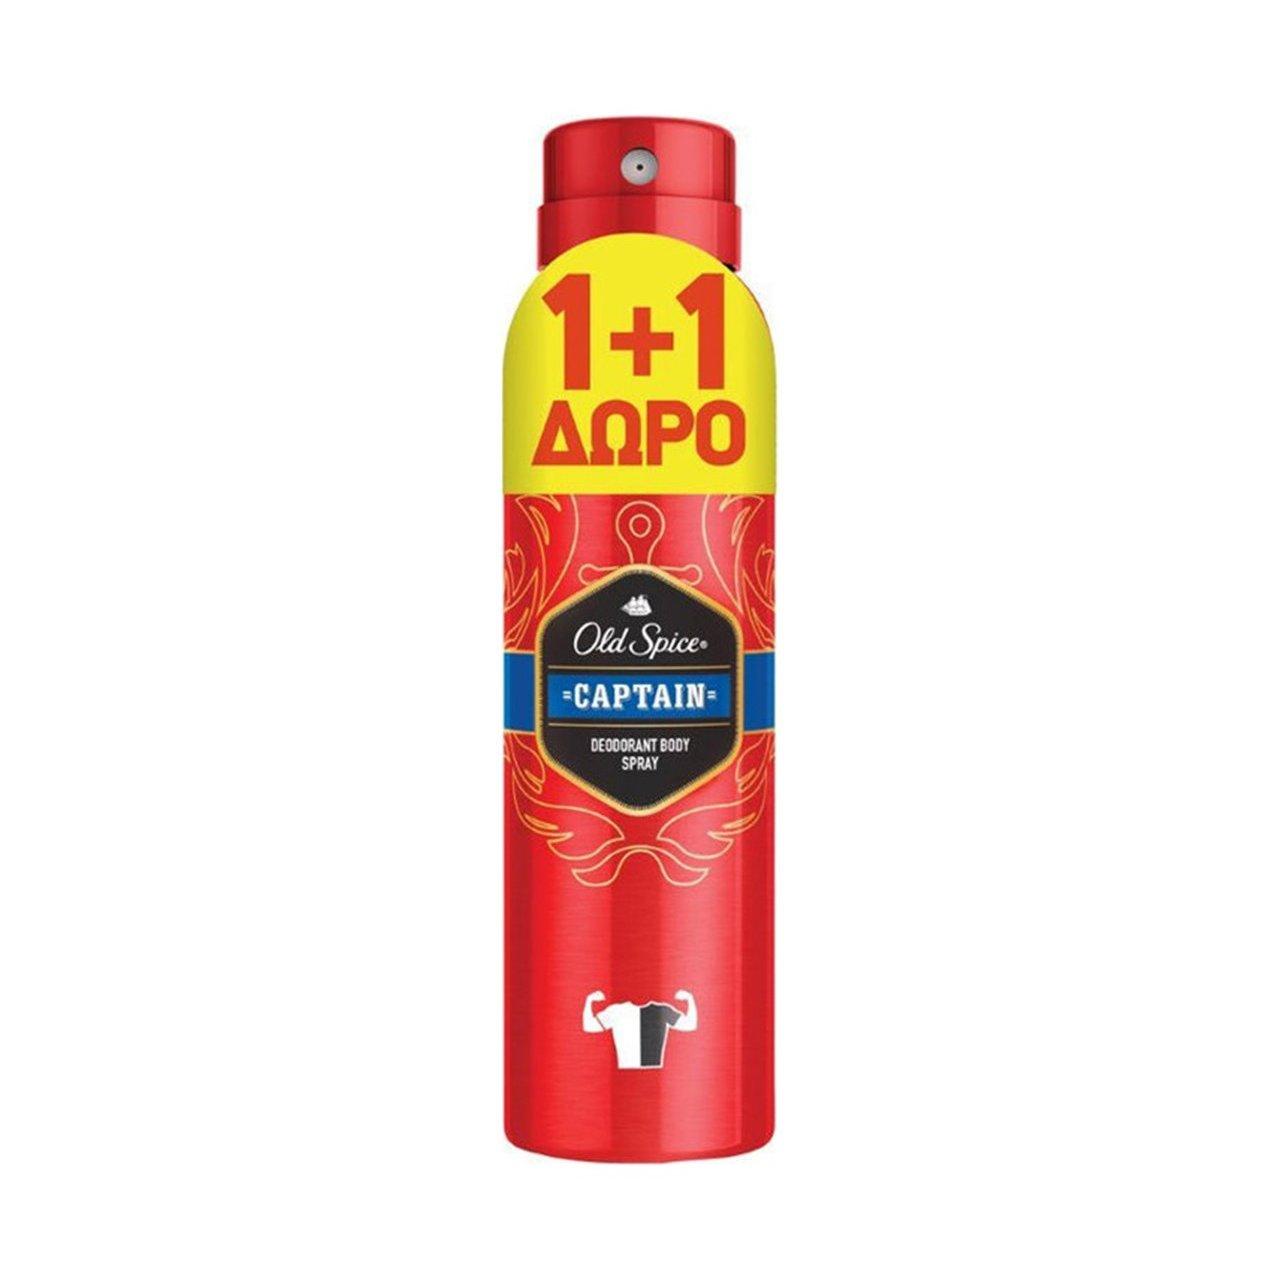 Old Spice Promo Pack Captain Deodorant Spray 2 x 150ml 1+1 Δώρο